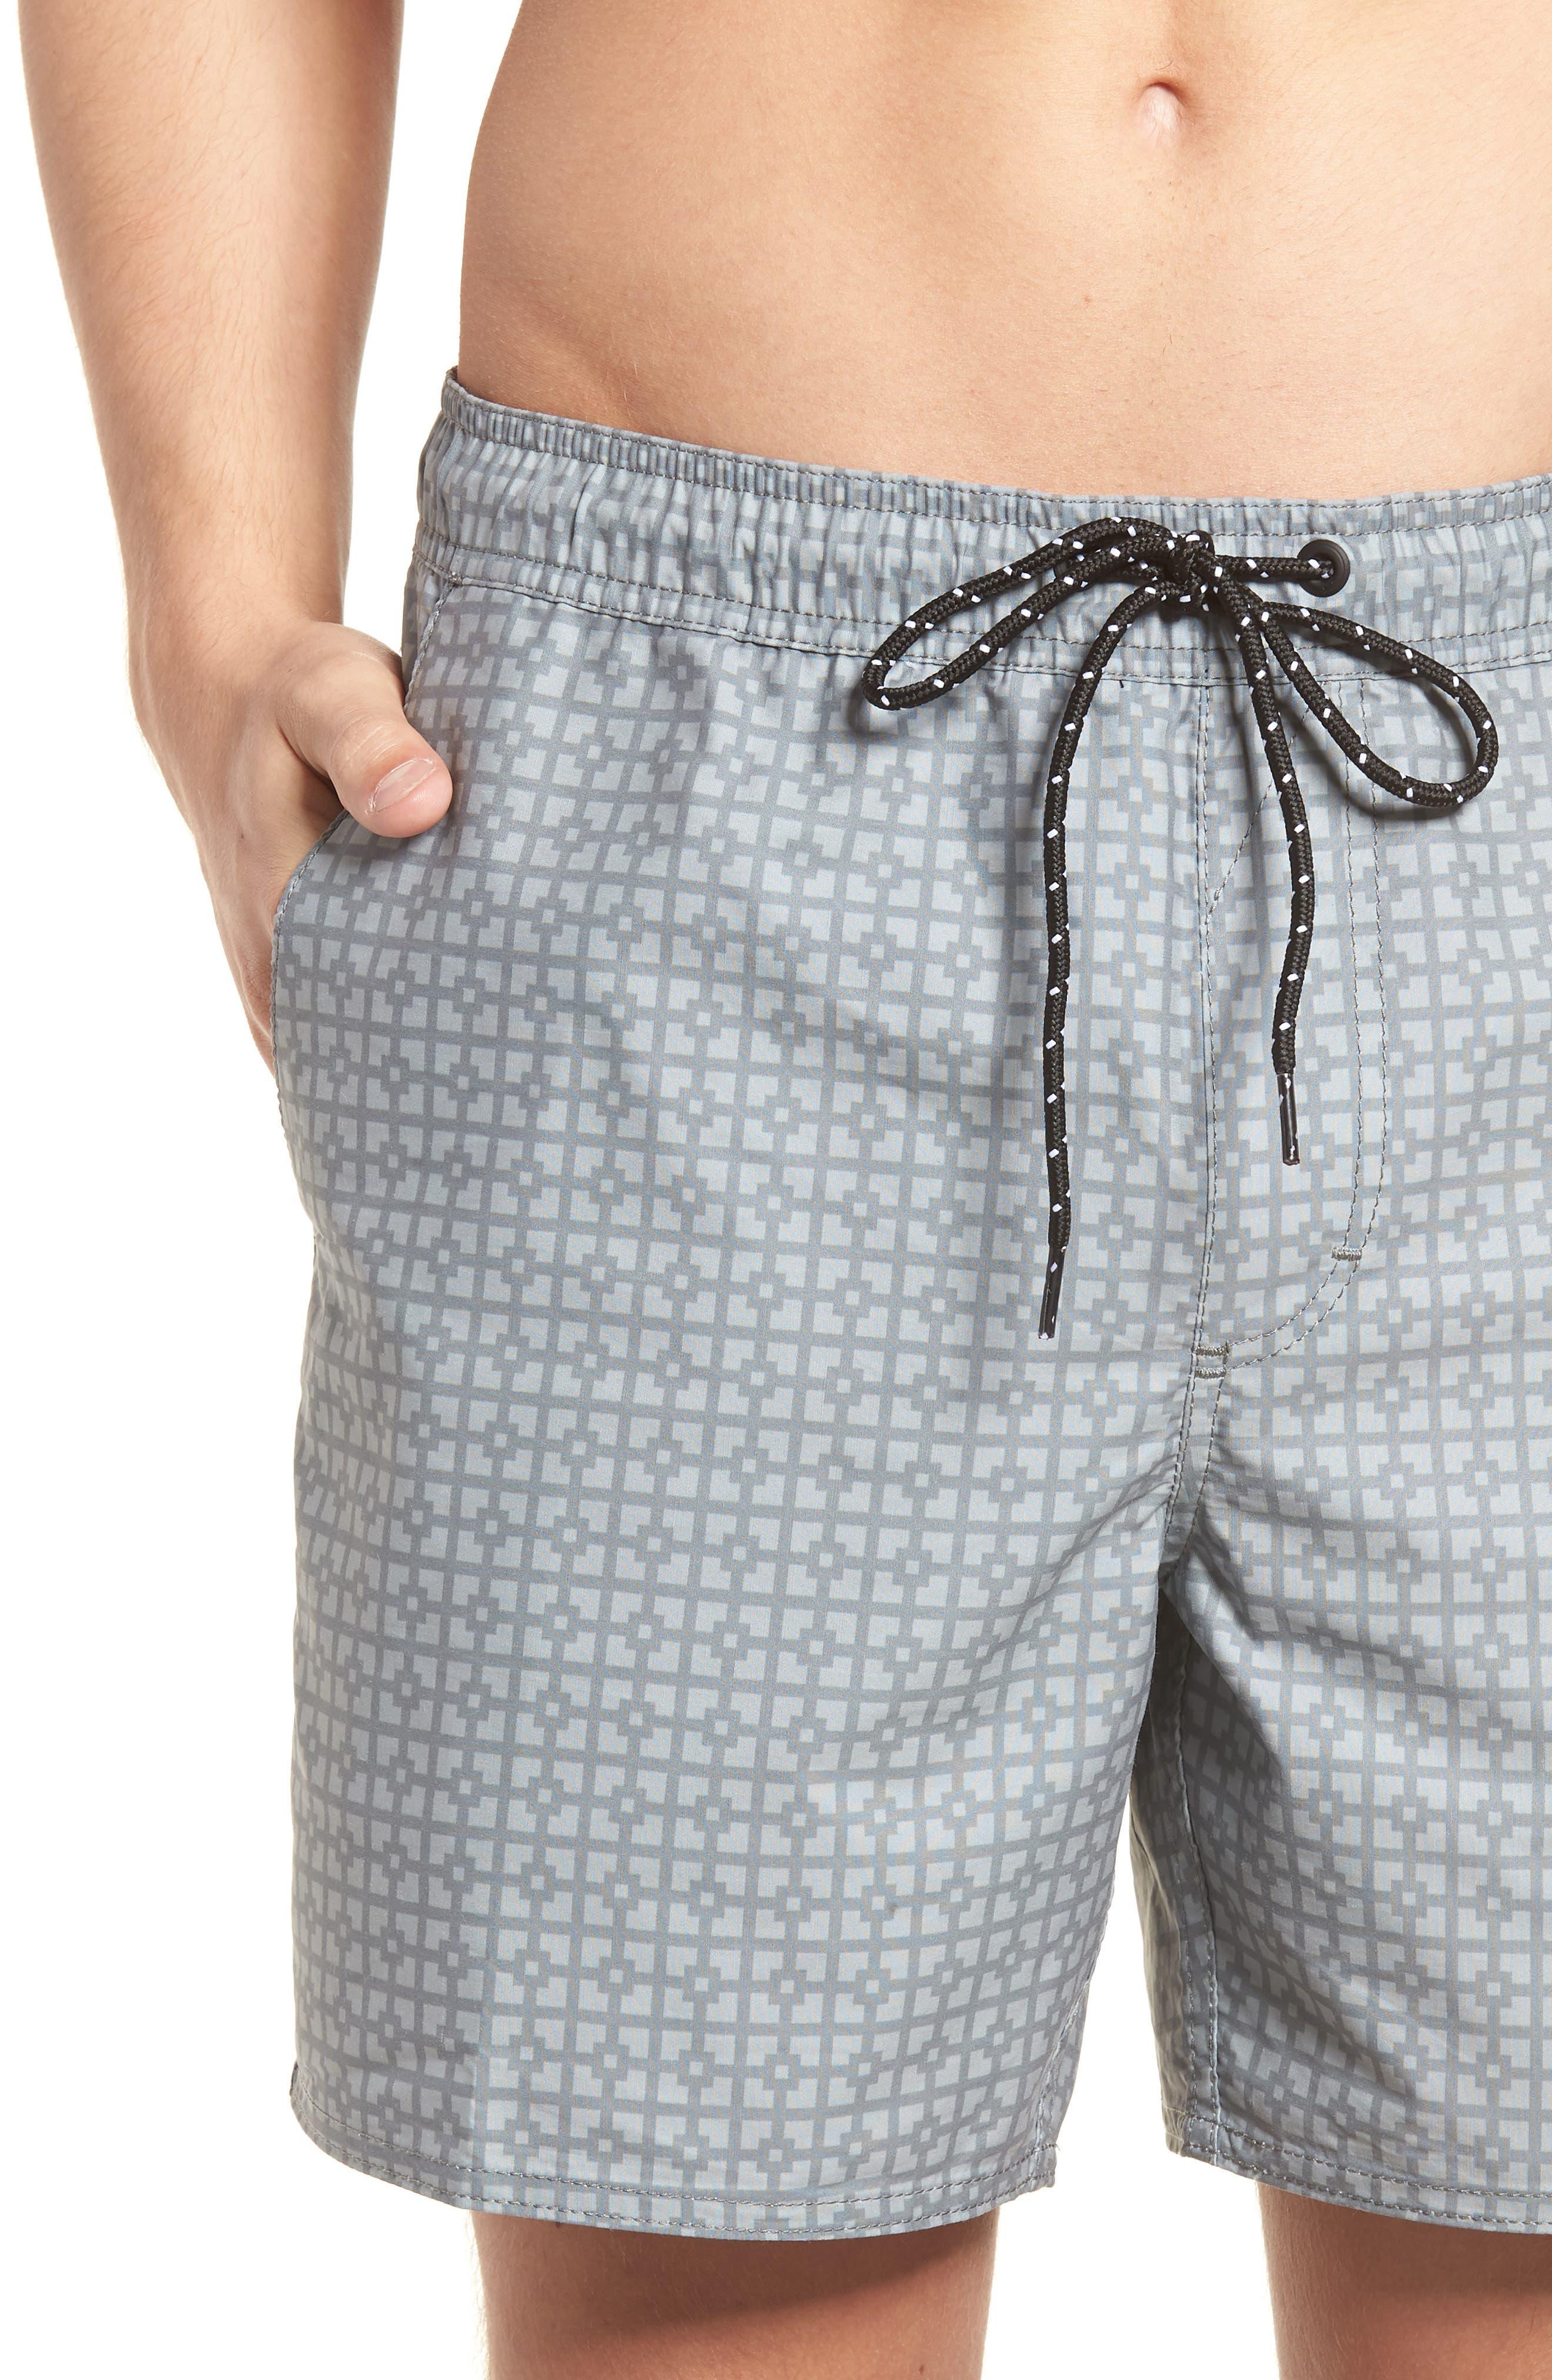 Belmont Pool Shorts,                             Alternate thumbnail 4, color,                             035